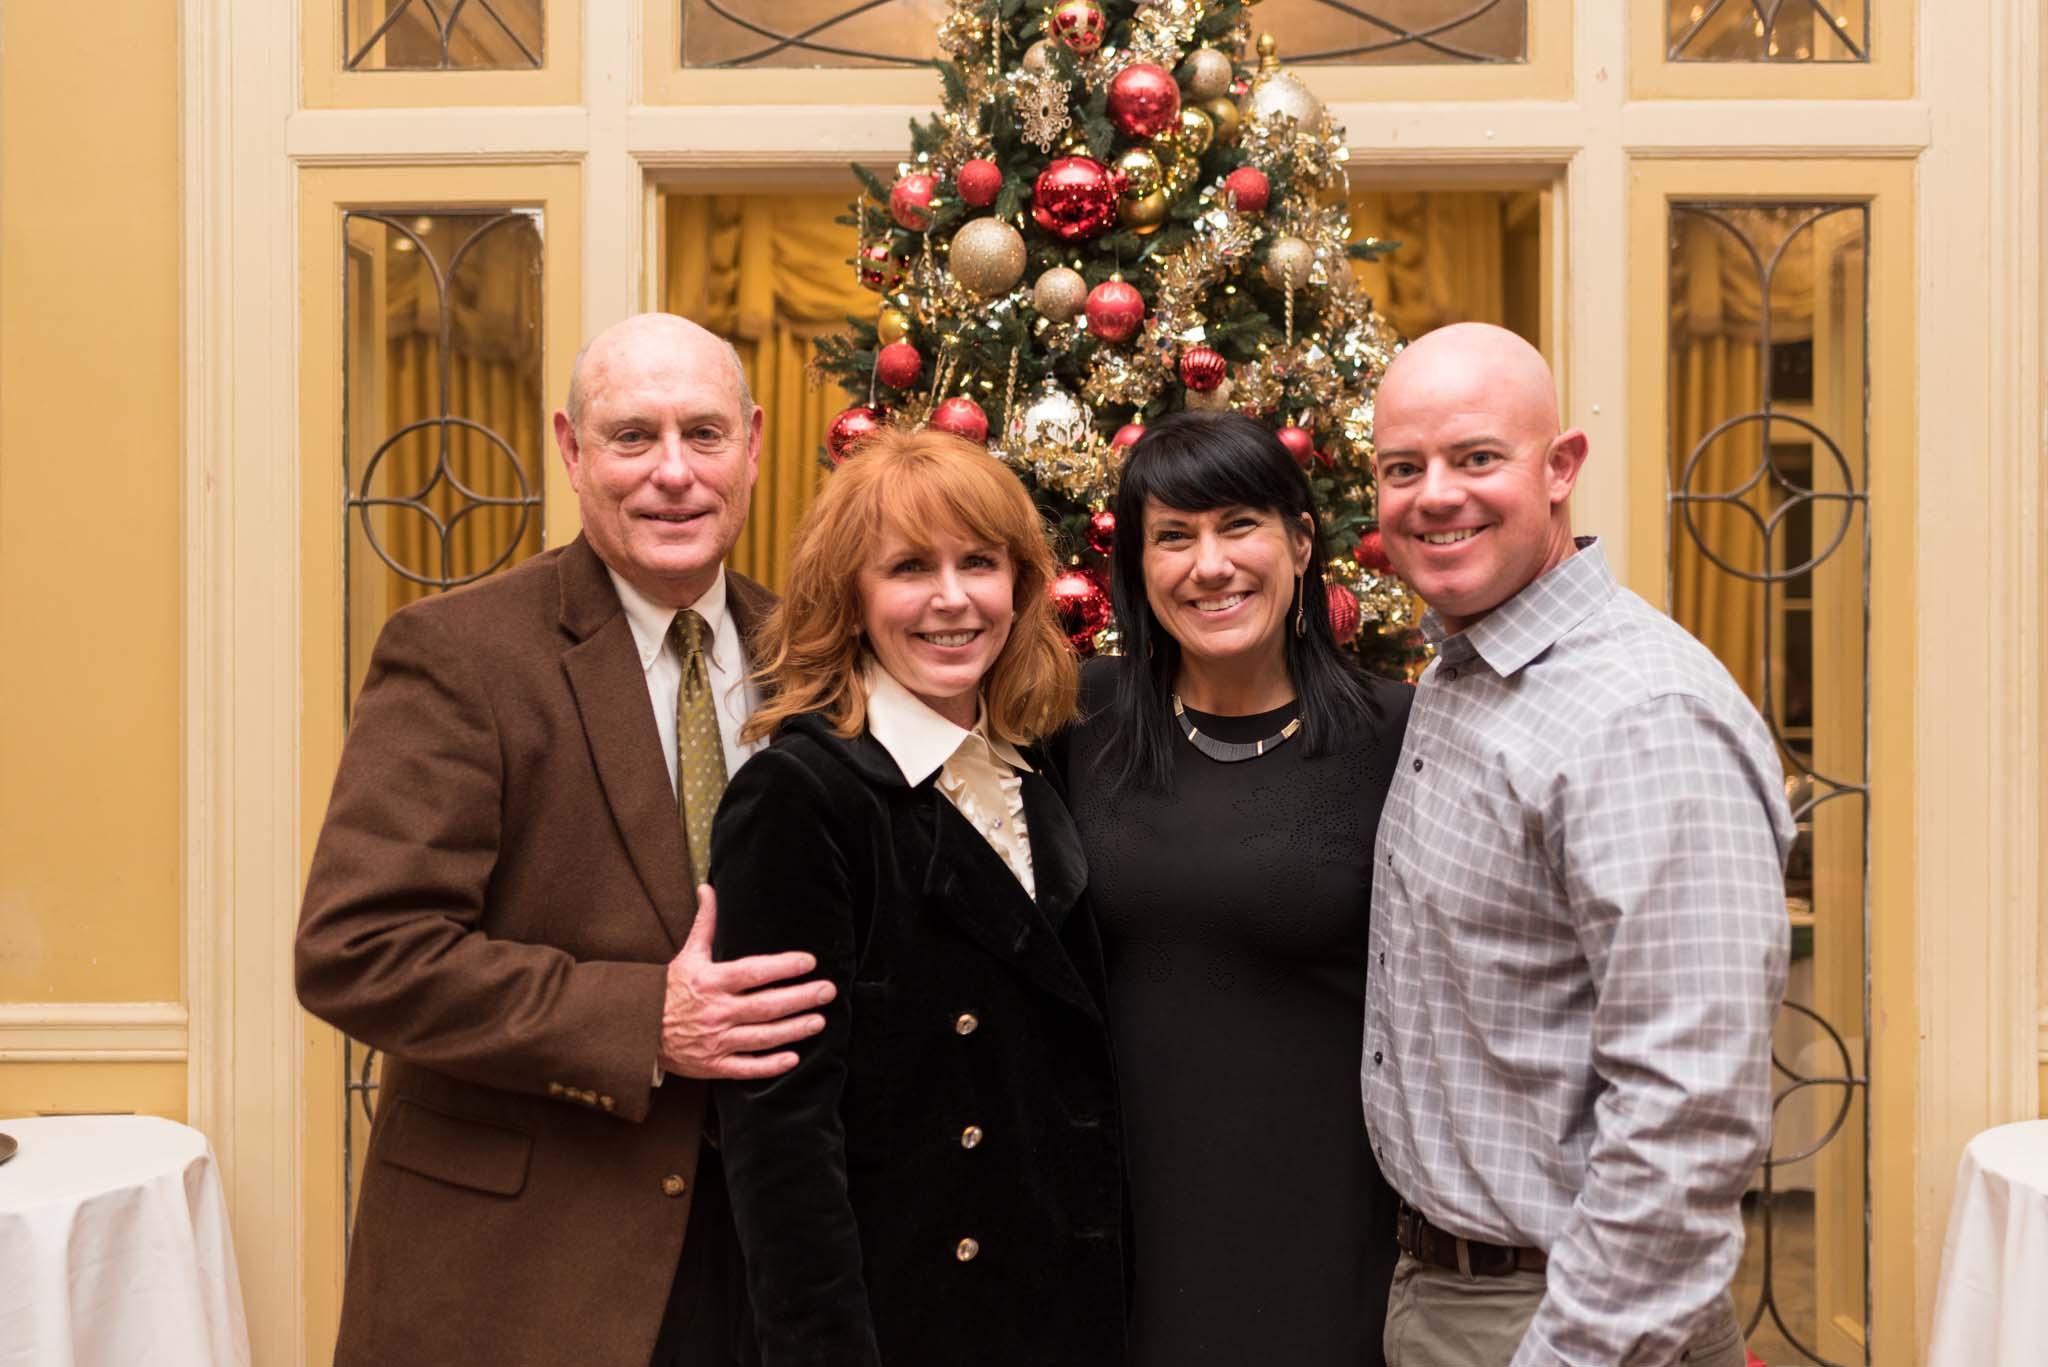 Mike and Hon. Caroline Craven with Jennifer and Derek Orgeron